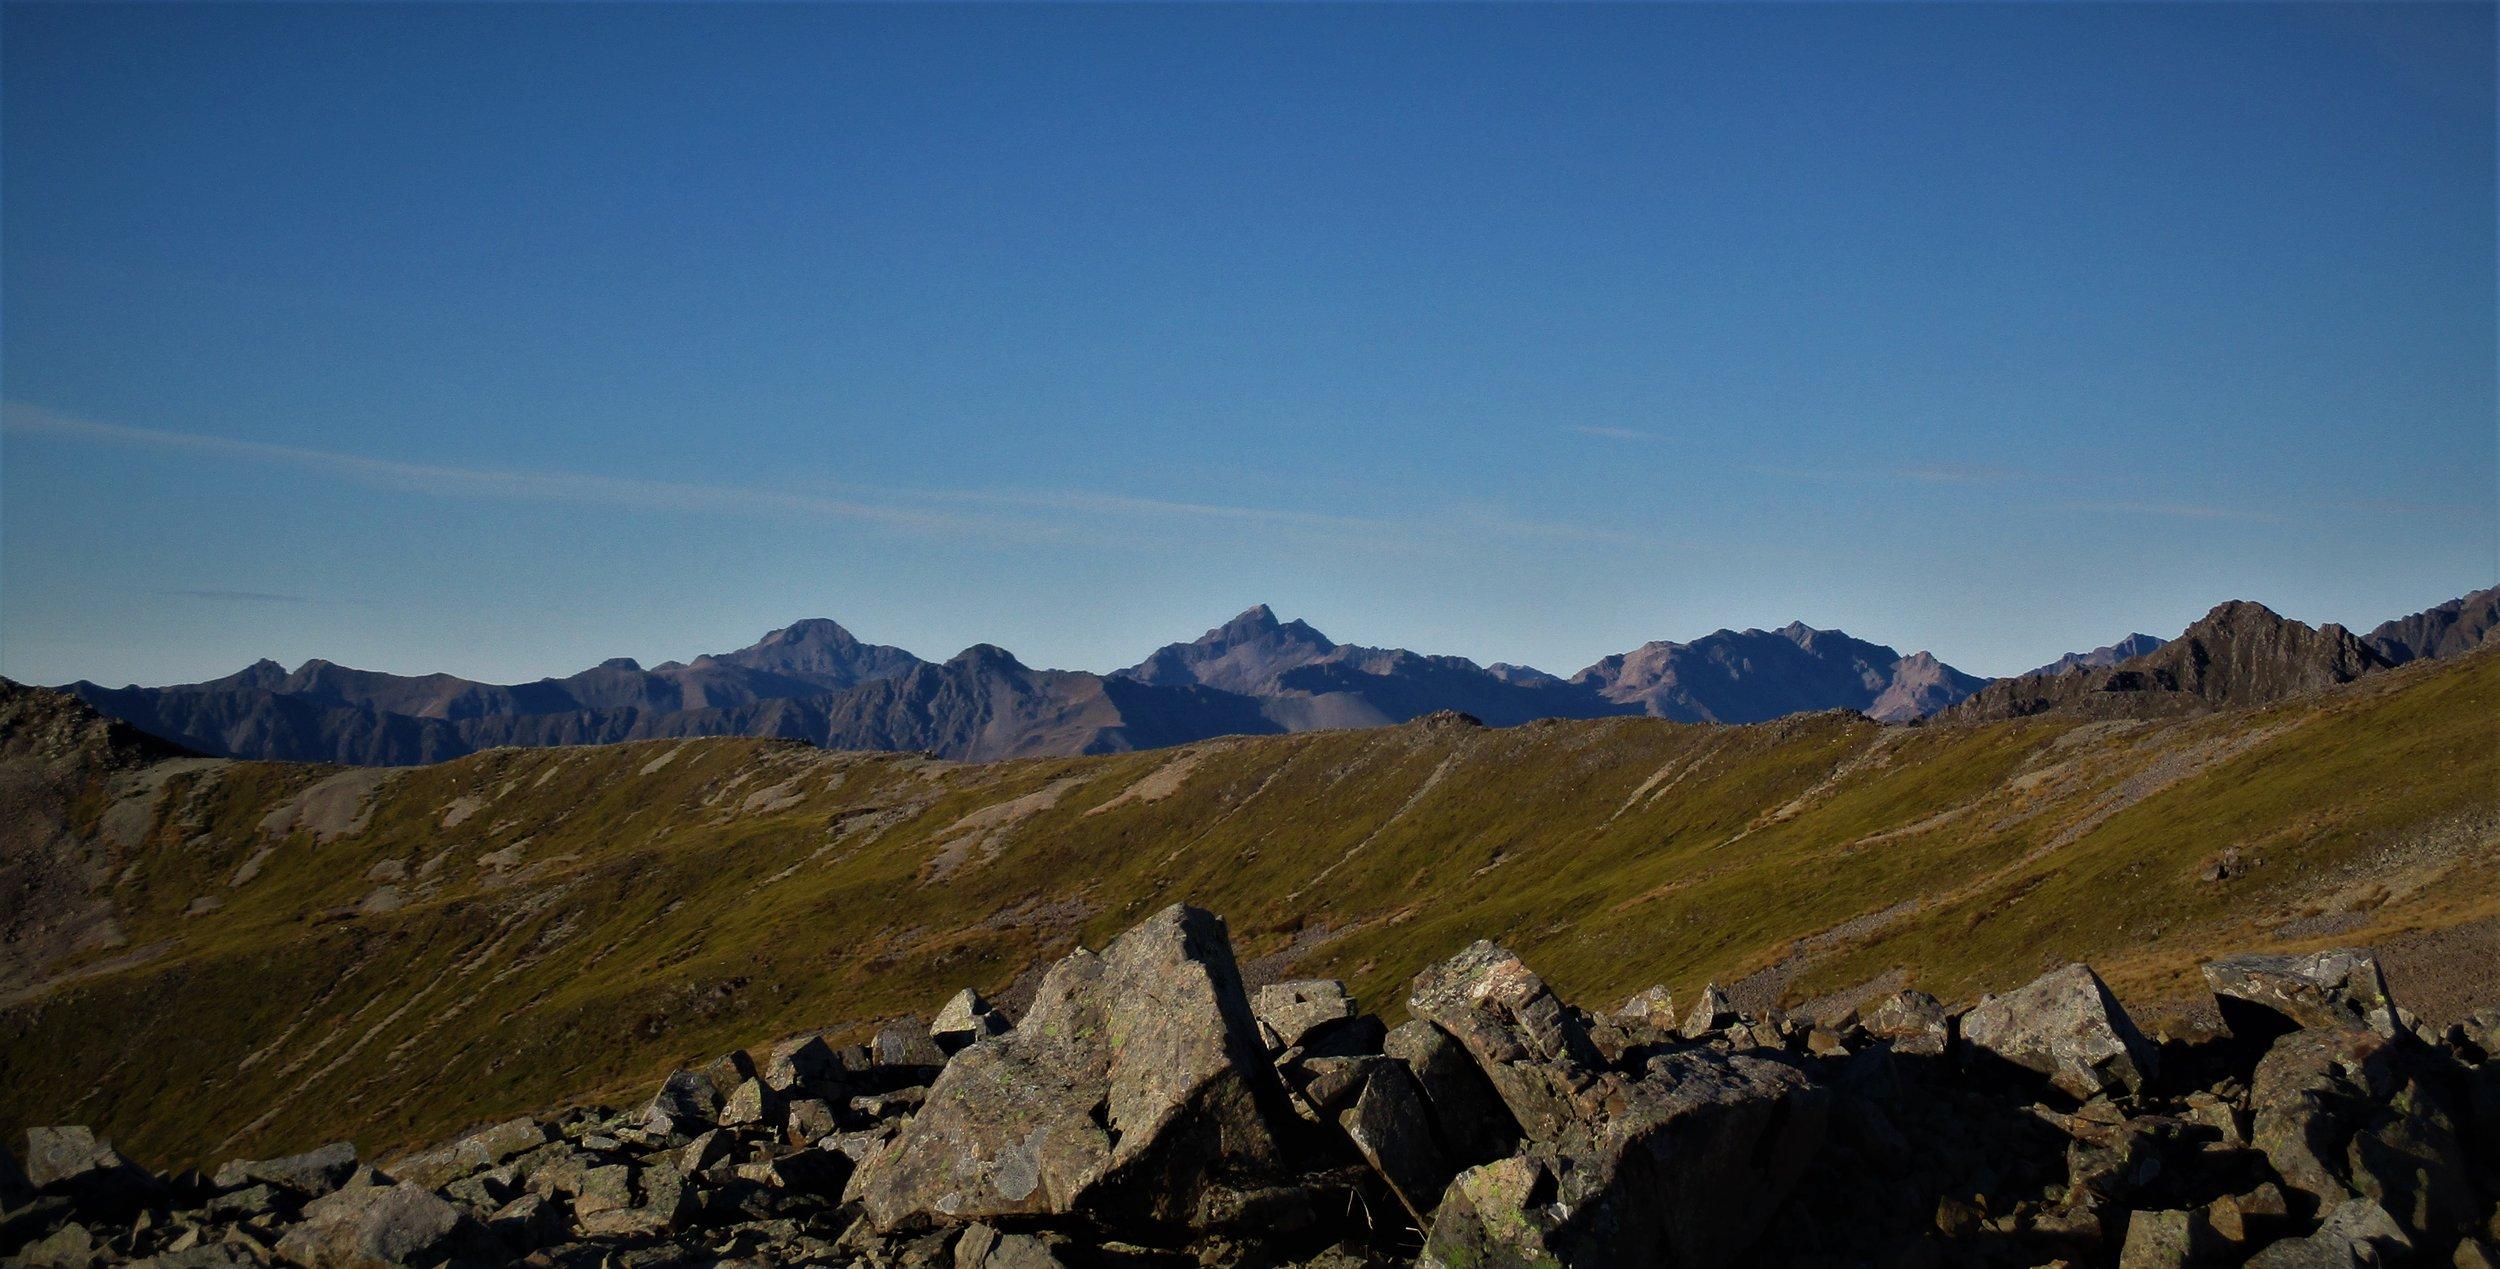 Chittenden and surrounding peaks , still snow less